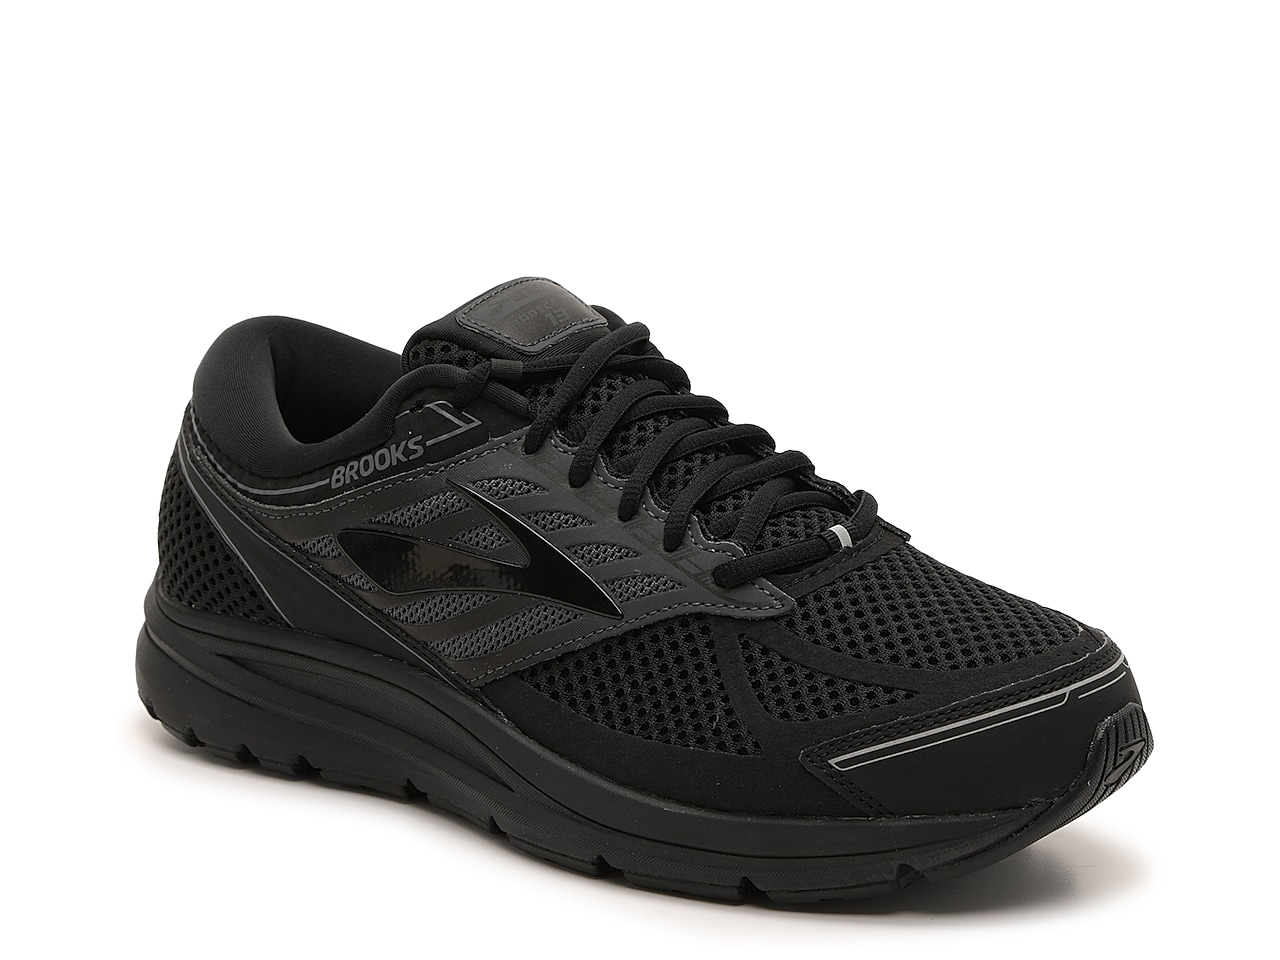 Addiction 13 Running Shoe - Men's